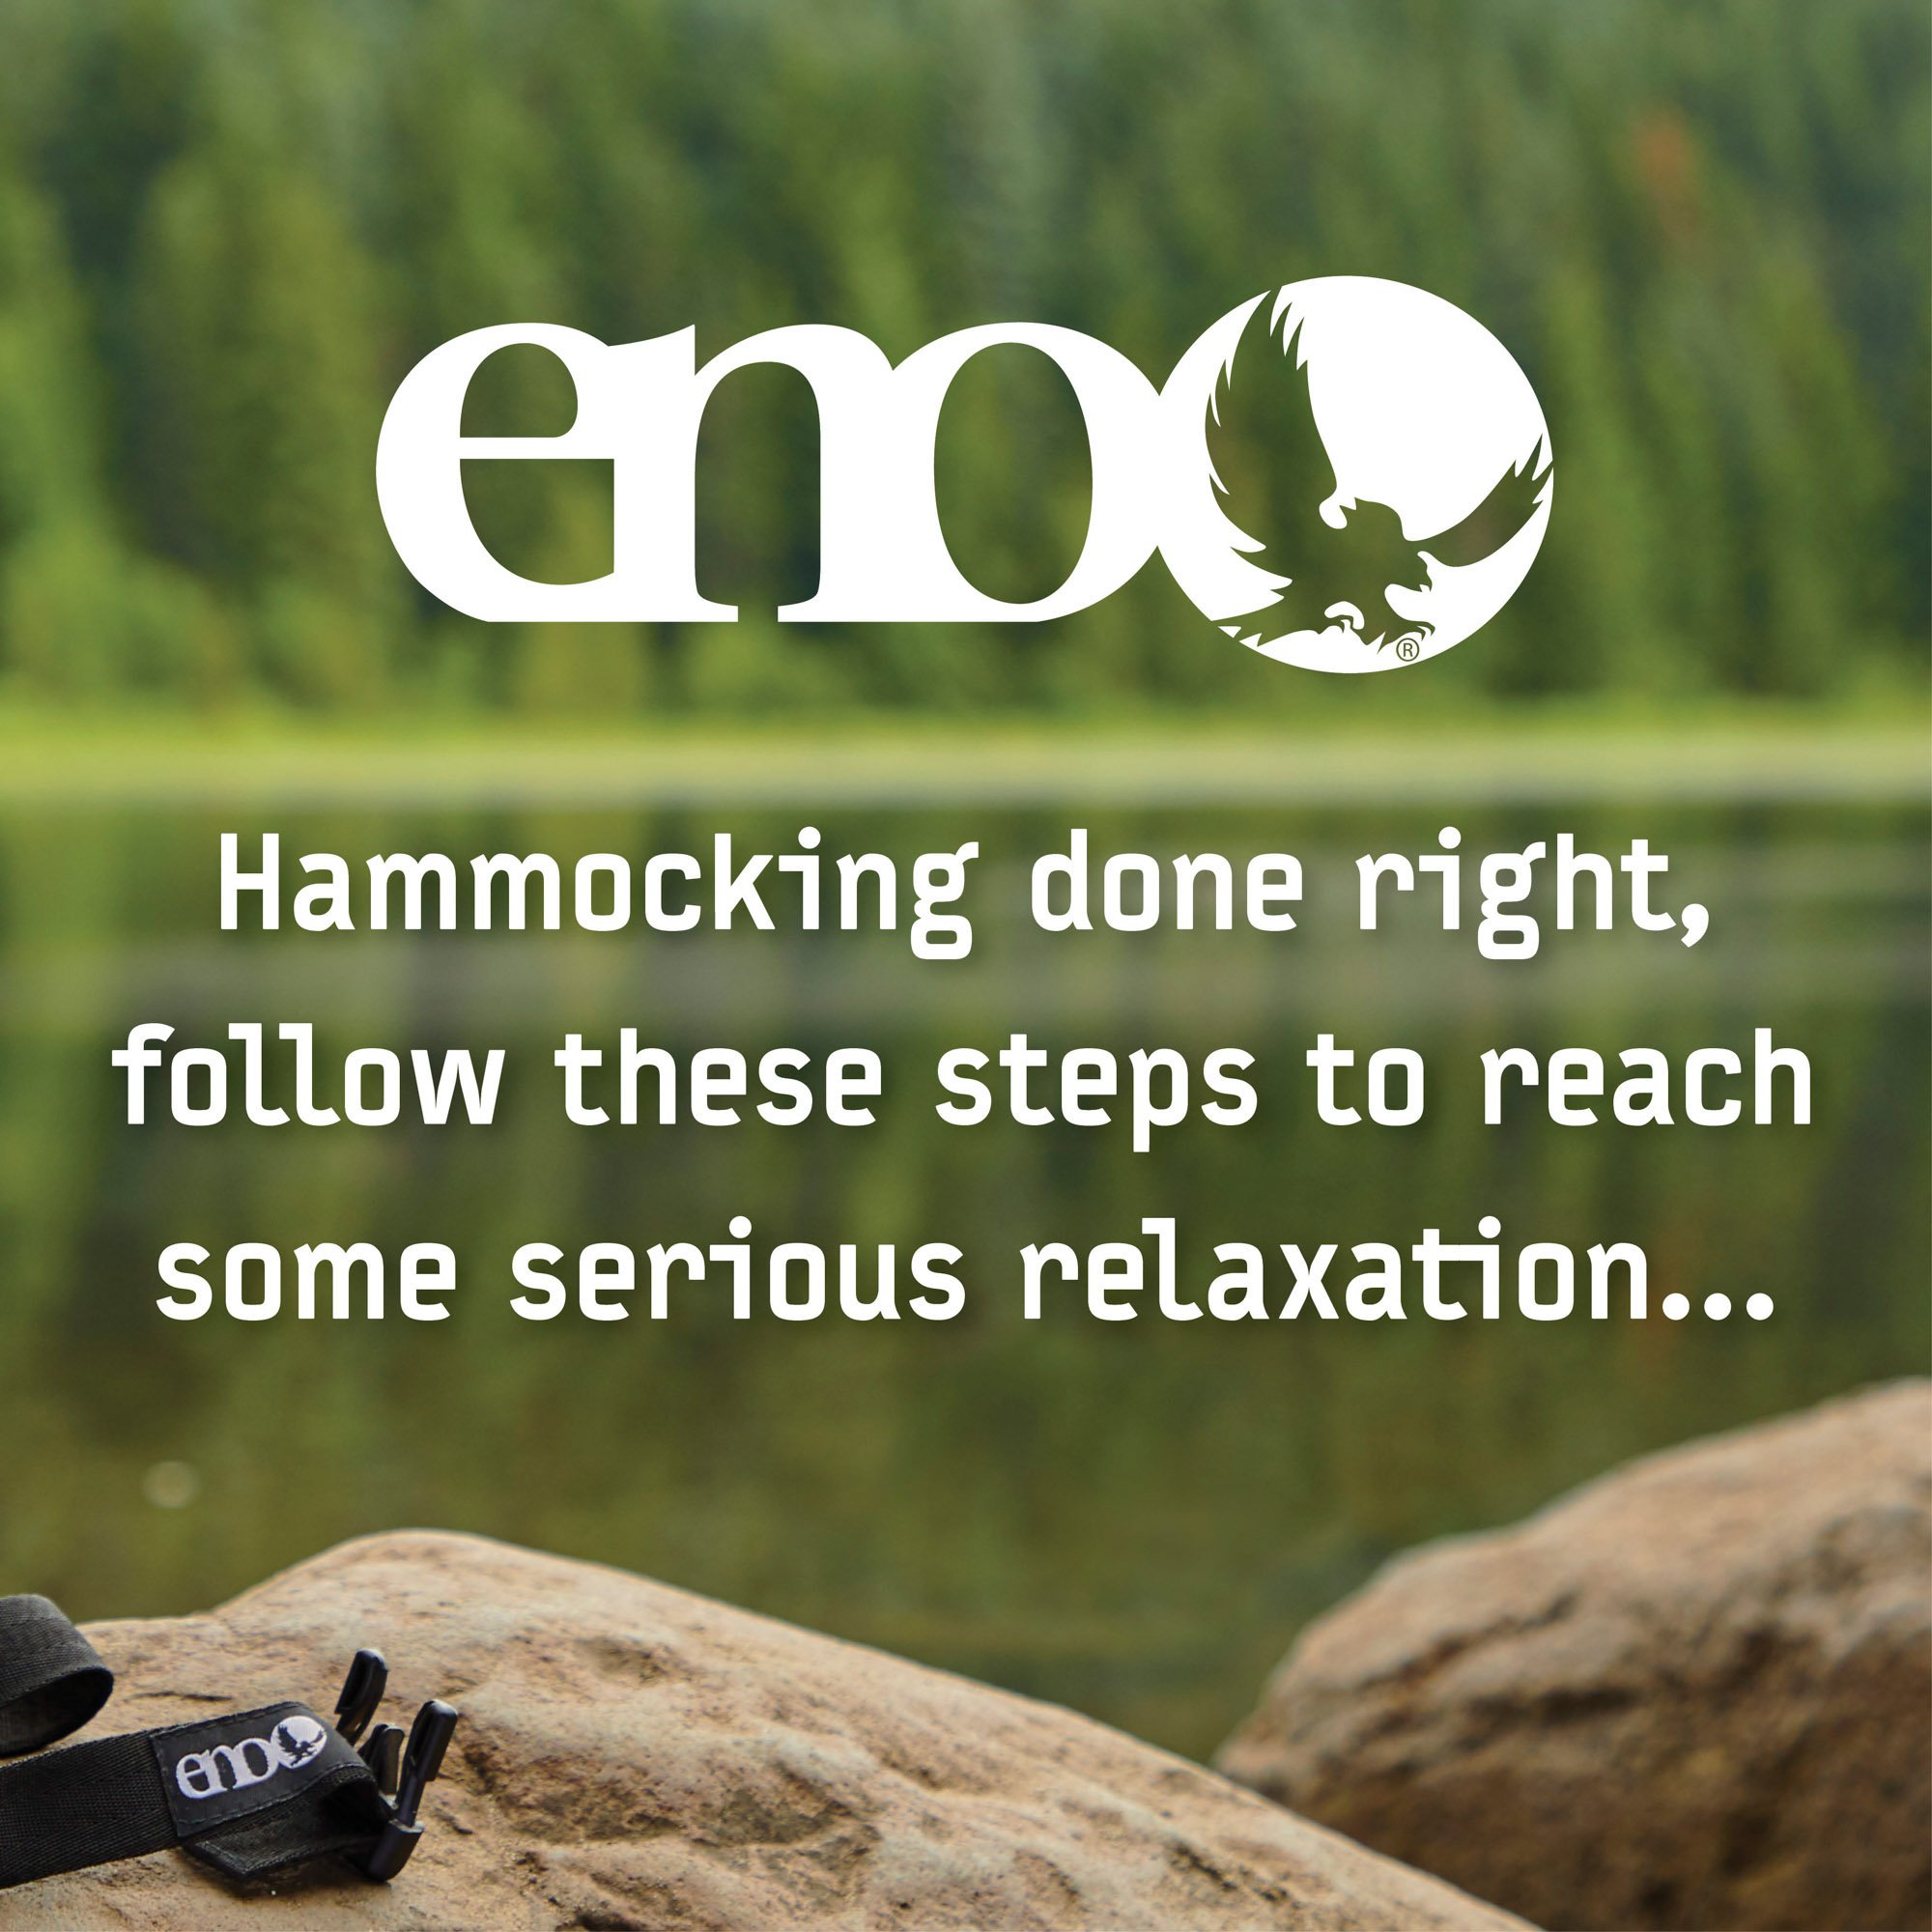 life singlenest eno day hammock first my cake real comments hammocks r eywvy present